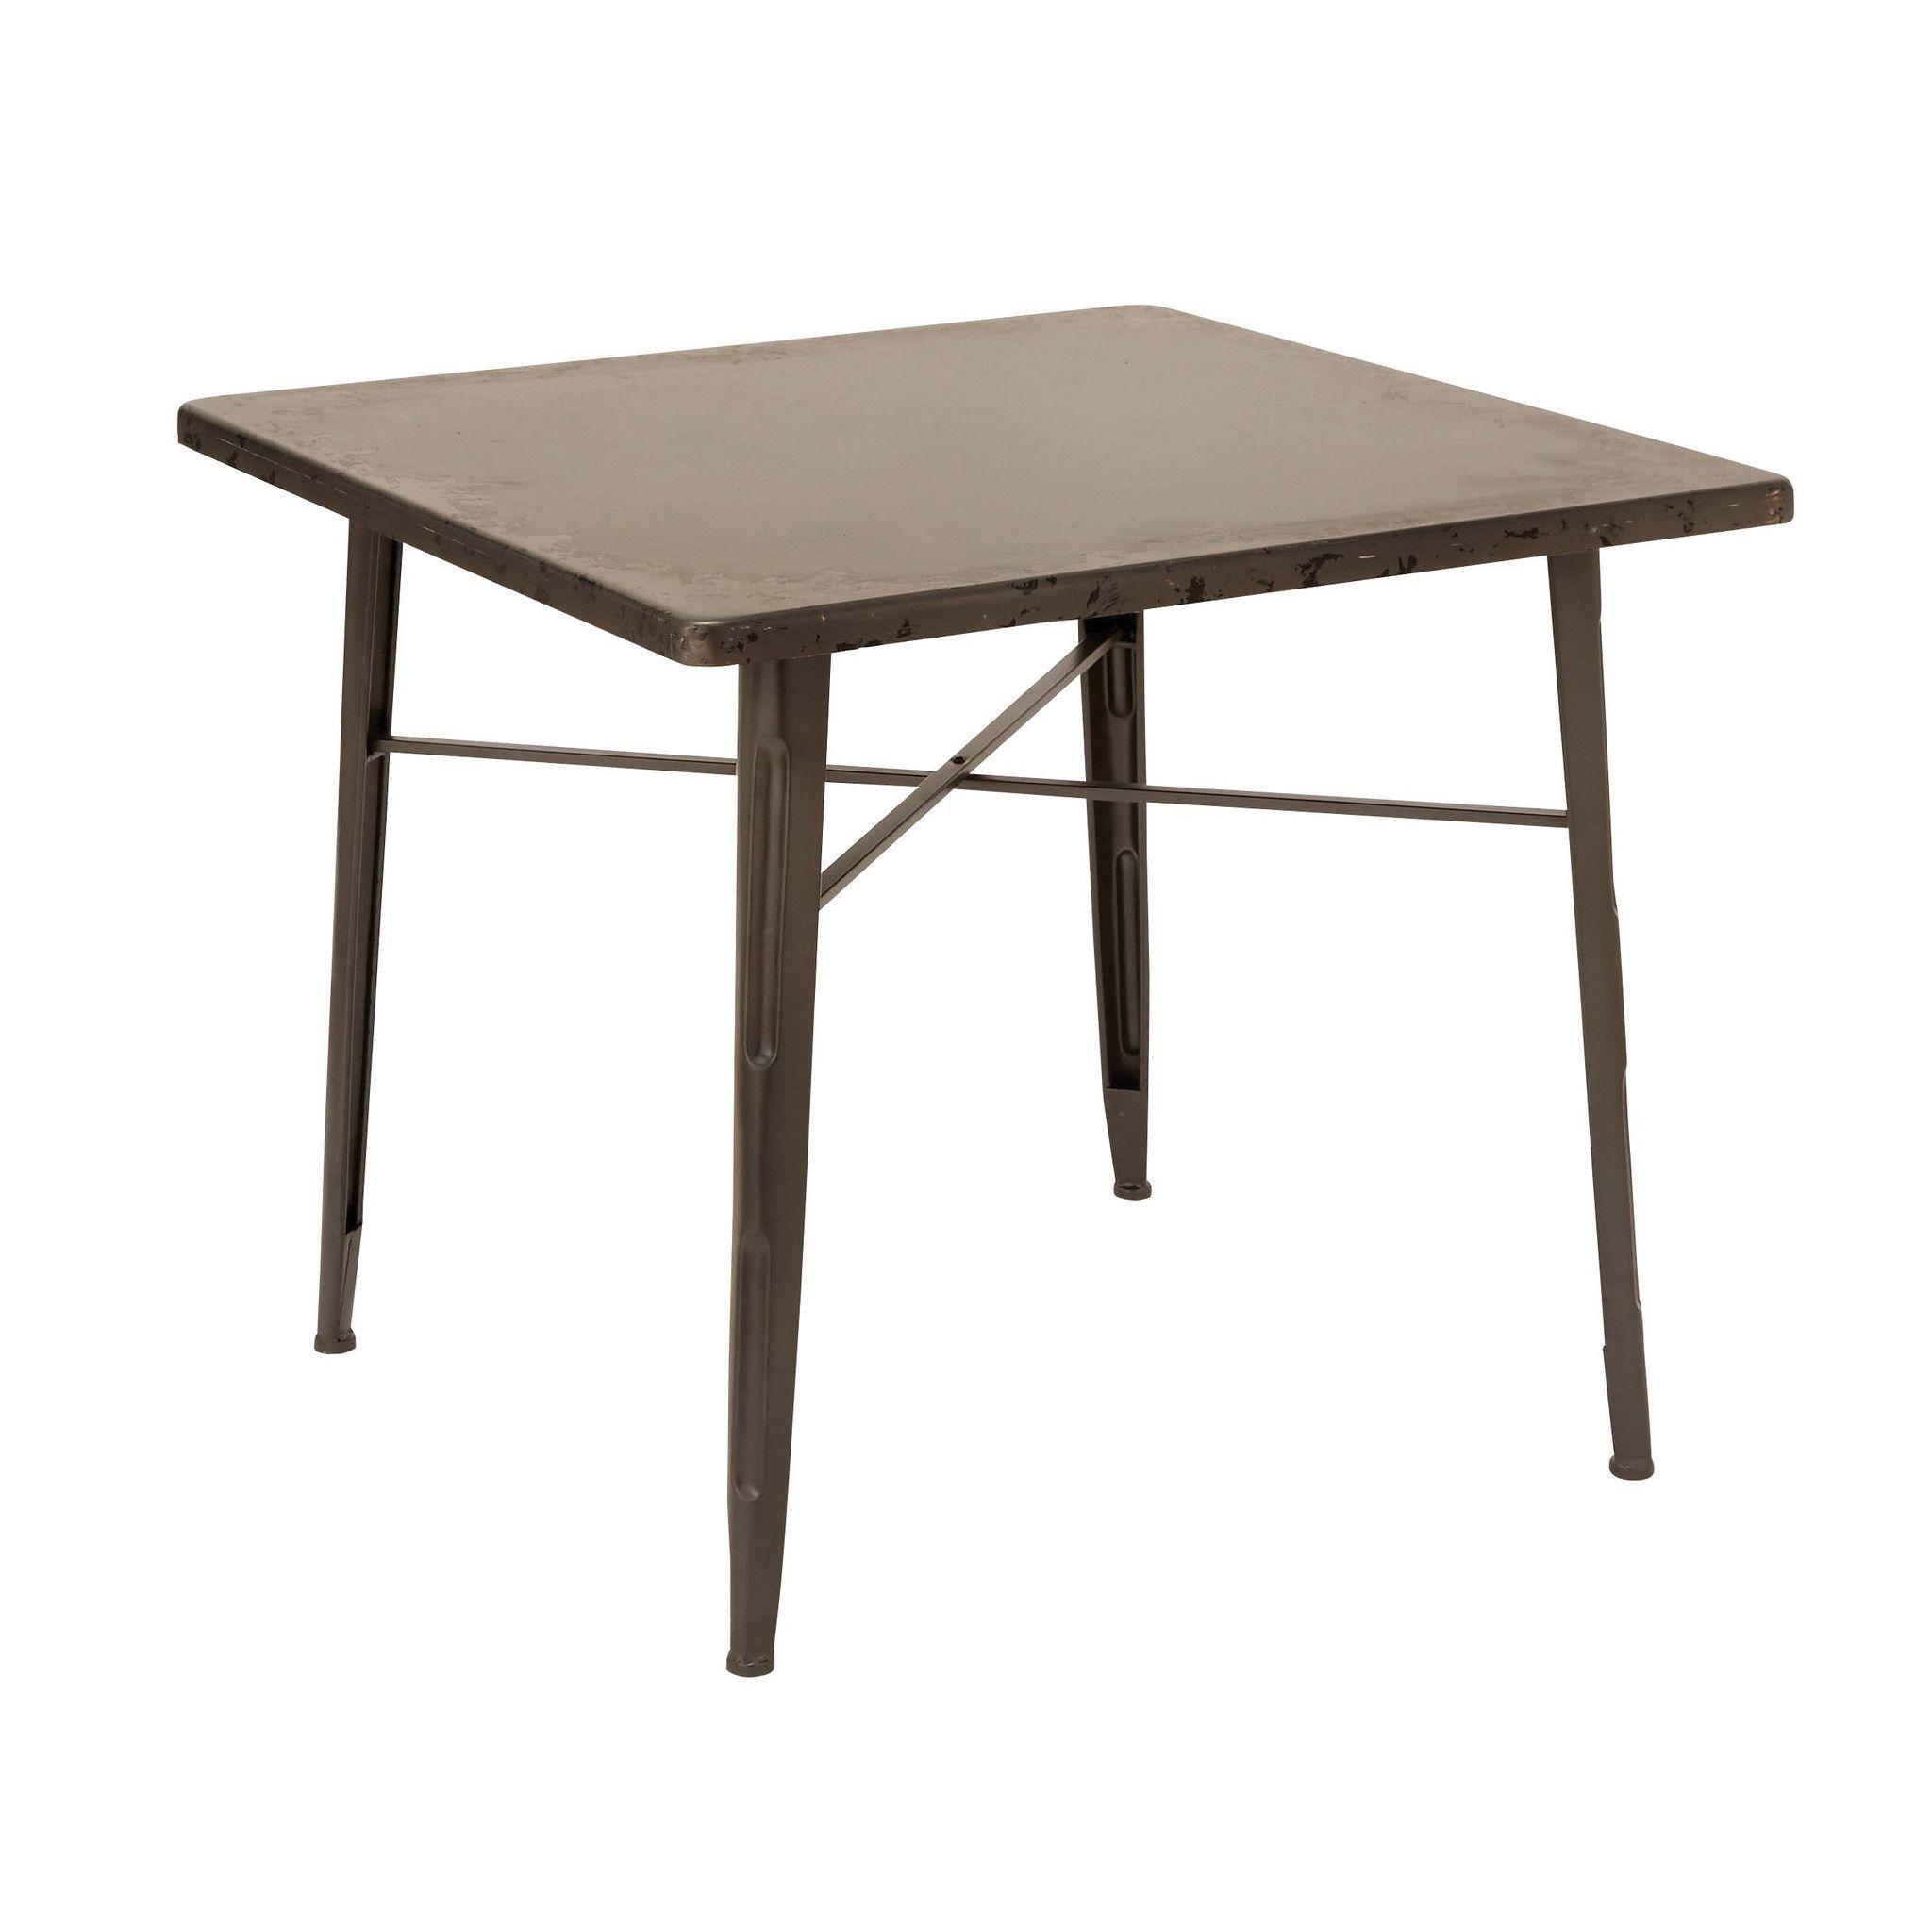 Ducar Cocktail Tables In Favorite Buy Wood Table Elegant Design In A Dark Brown Color At Harvey (Gallery 16 of 20)